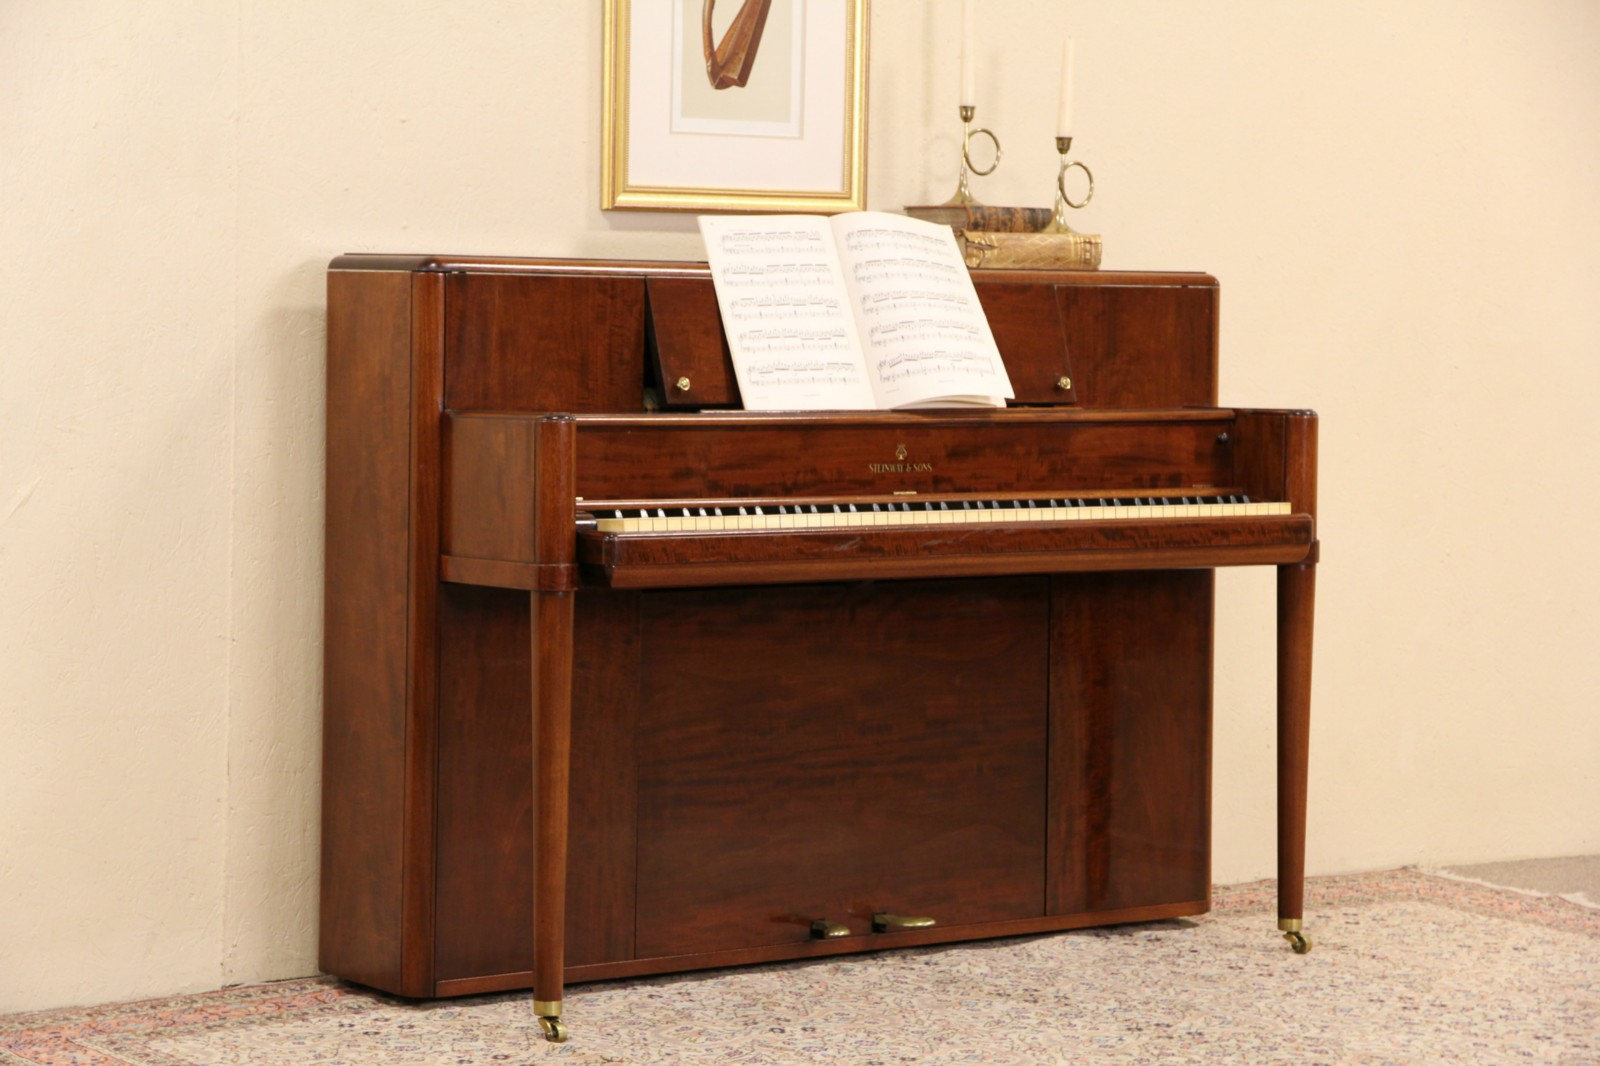 Steinway Console Upright 41 Midcentury Modern 1942 Vintage Mahogany Piano